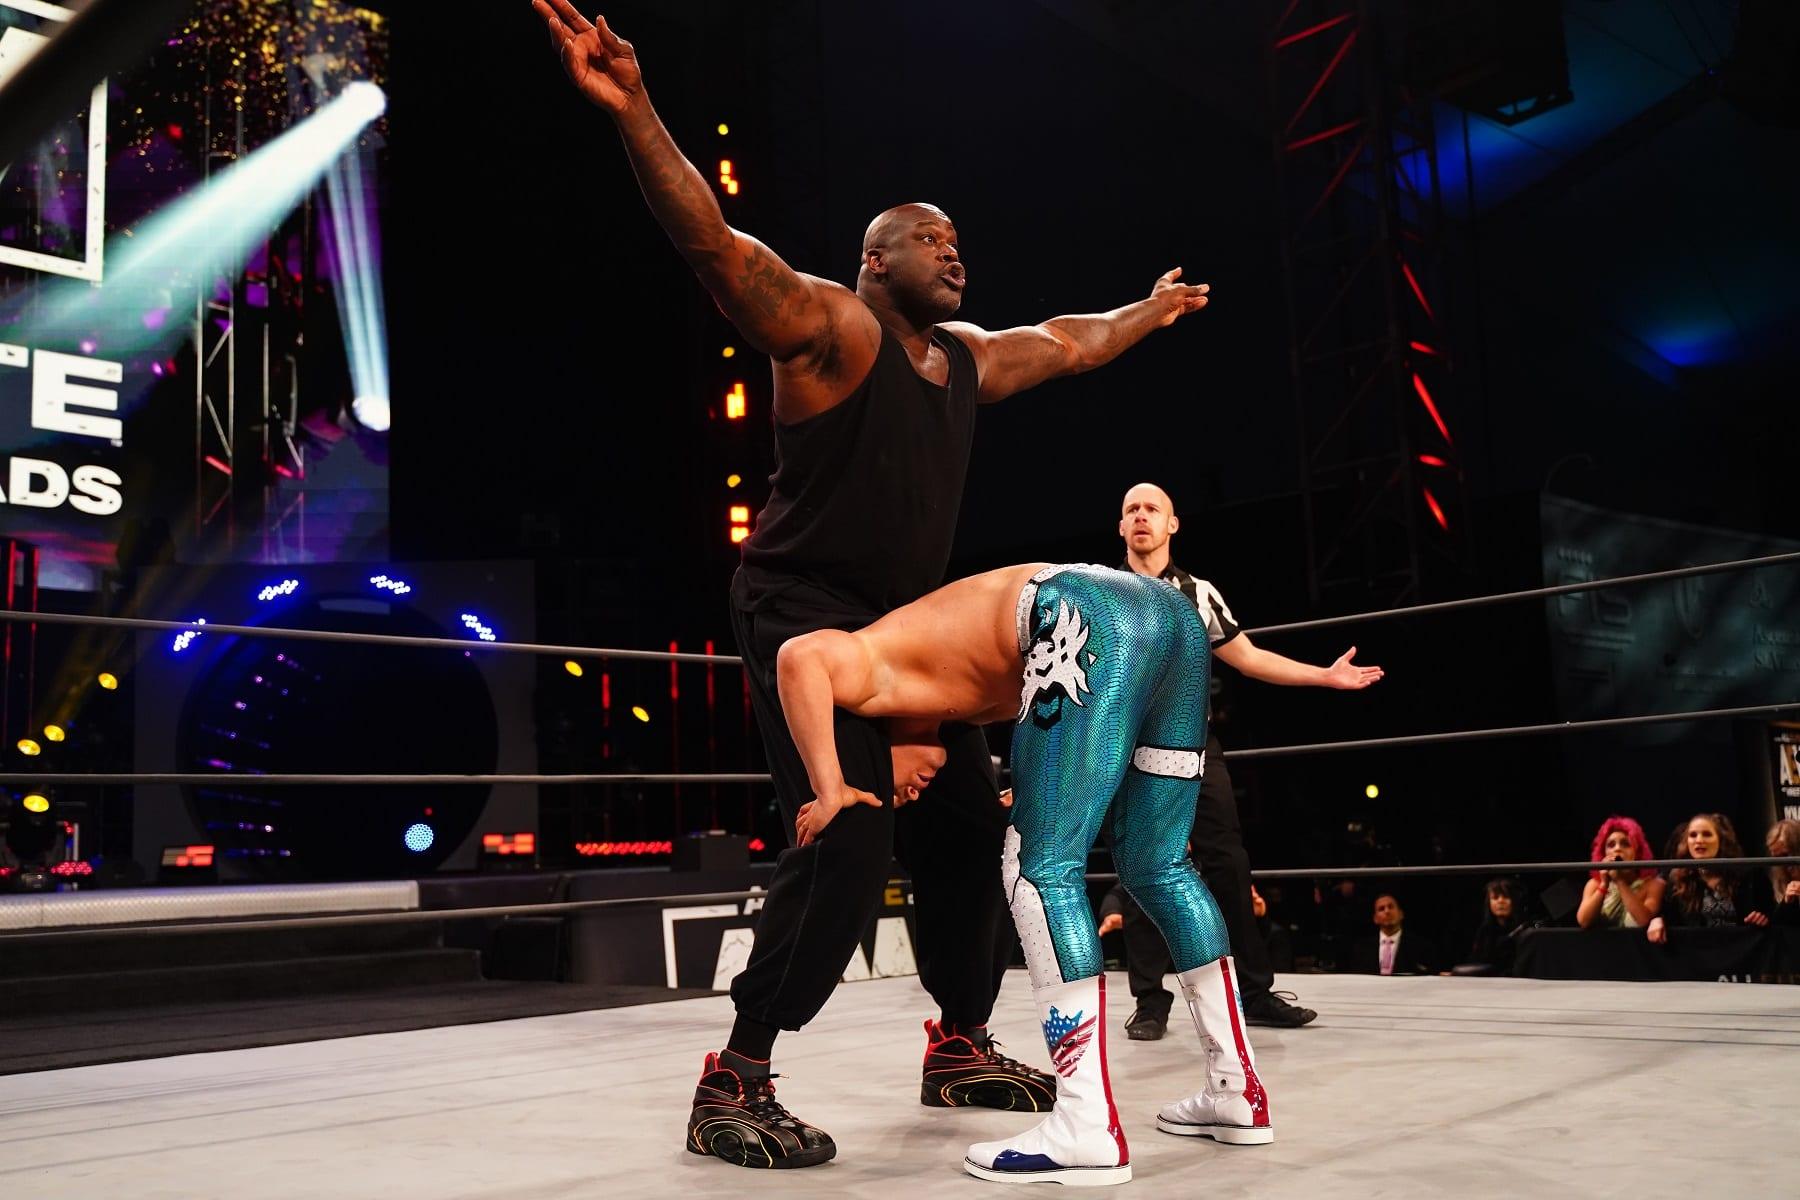 AEW Dynamite Stays Under 1 Million Viewers - Wrestling Inc.